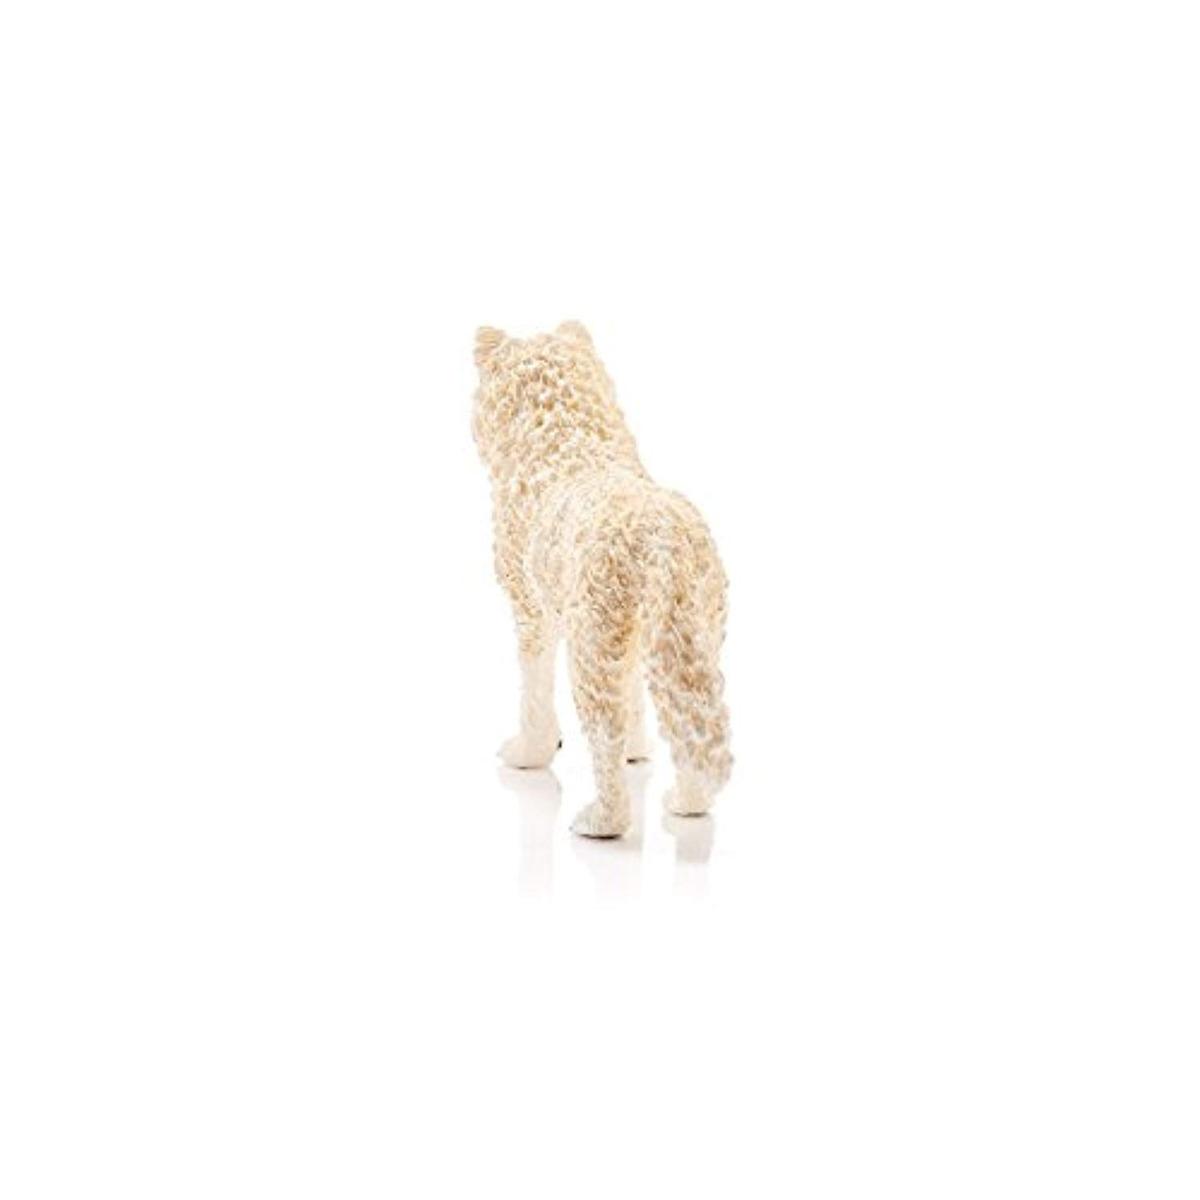 ARCTIC Wolf Schleich Wild Life figura-modello 14742